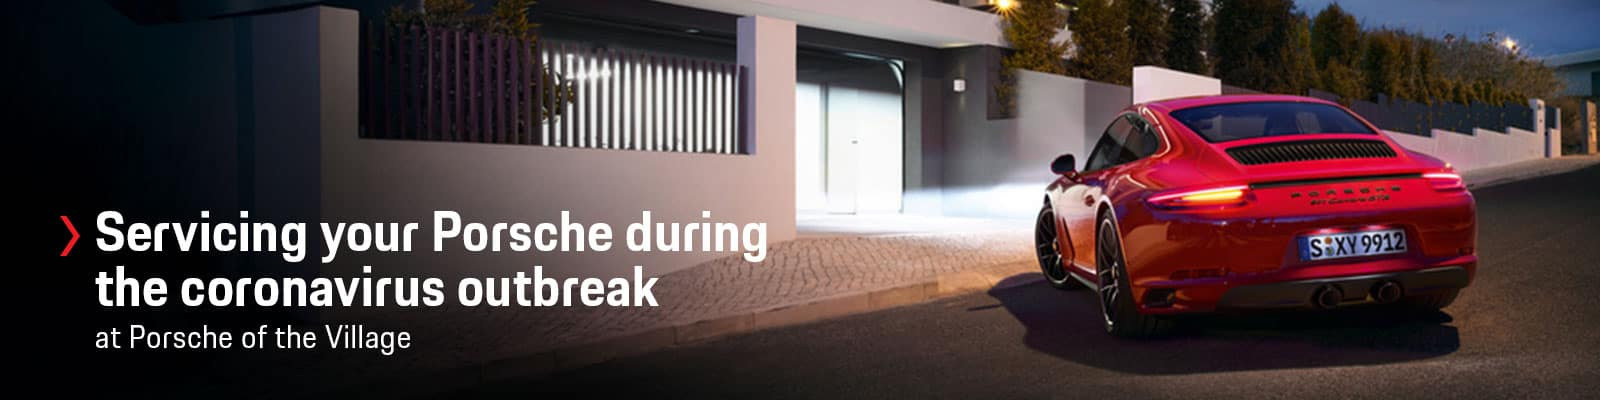 Servicing Your Porsche During the Coronavirus Outbreak